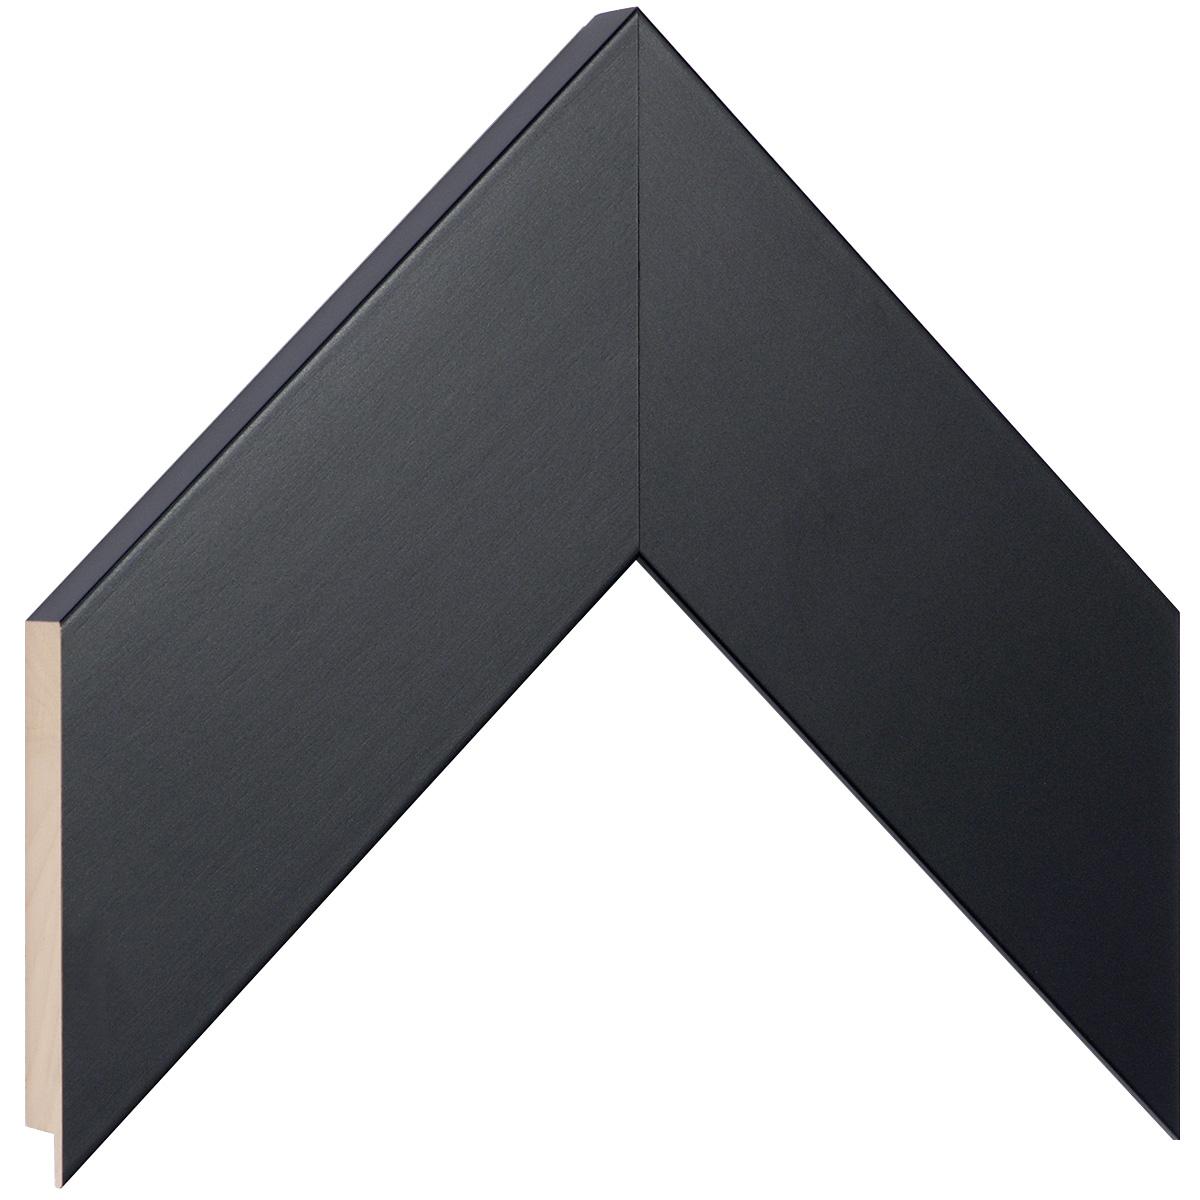 Moulding ayous, width 68mm height 20 - black